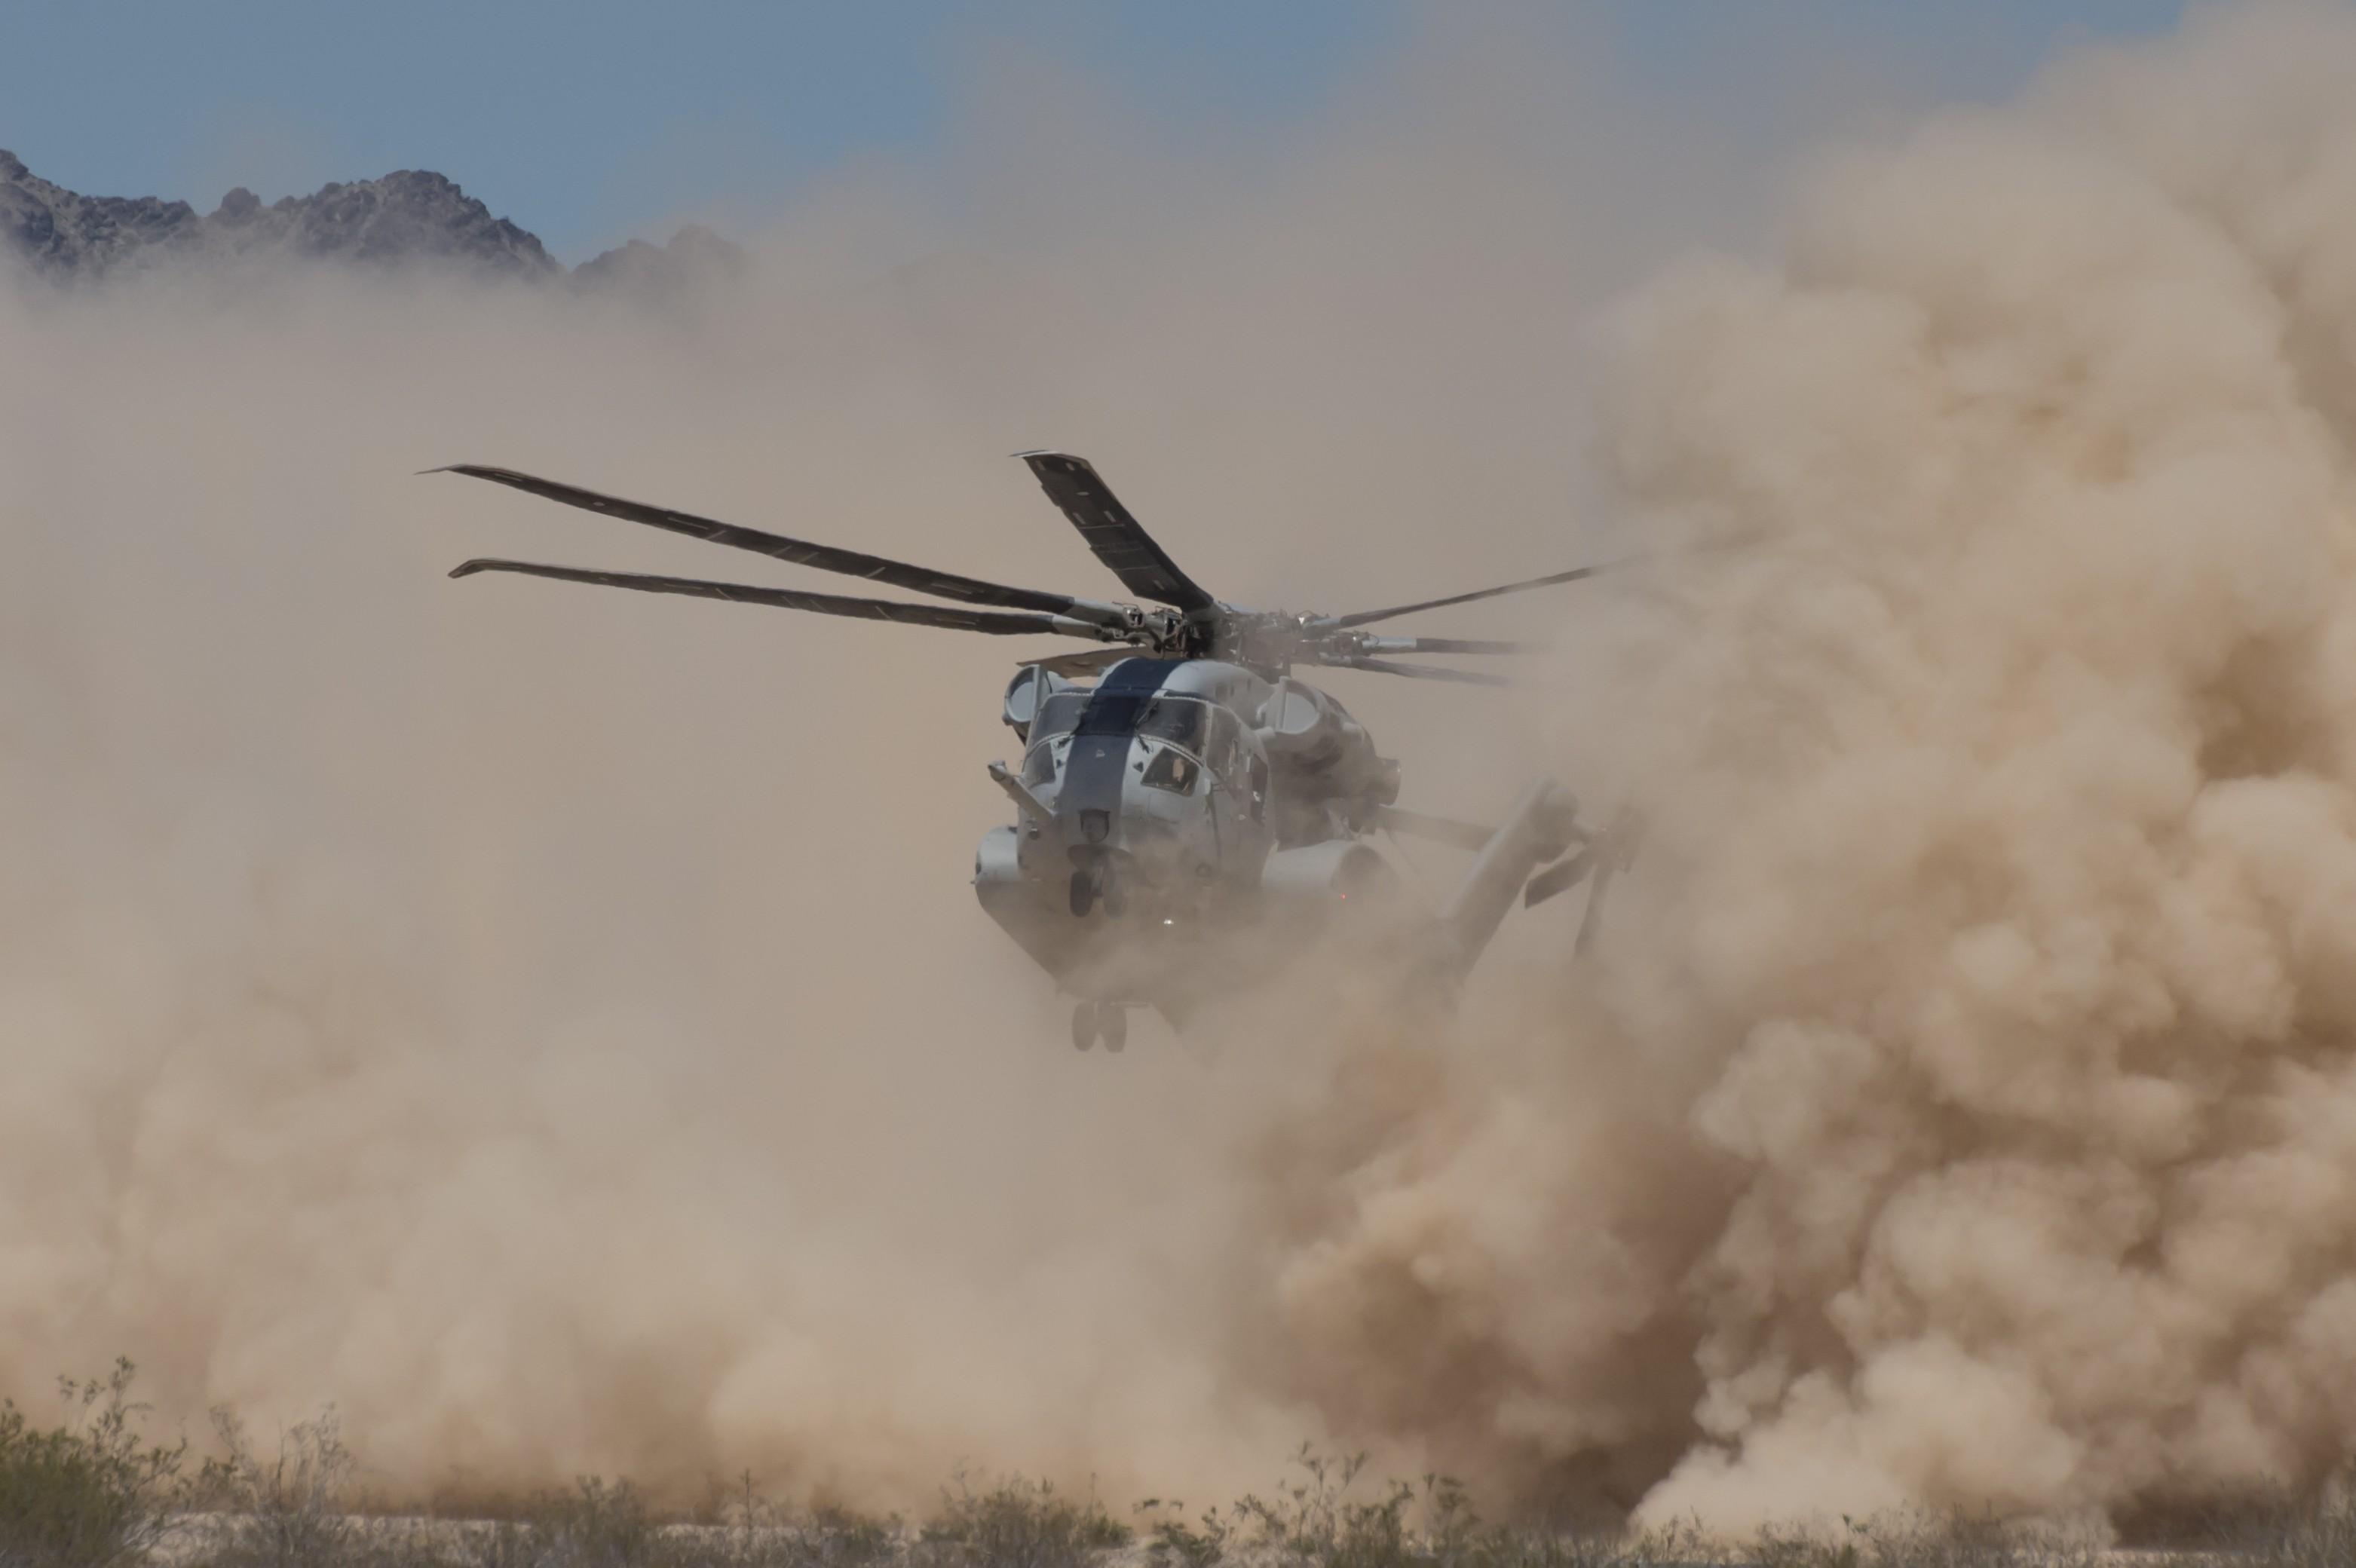 All Hail the King: U S  Army Yuma Proving Ground tests